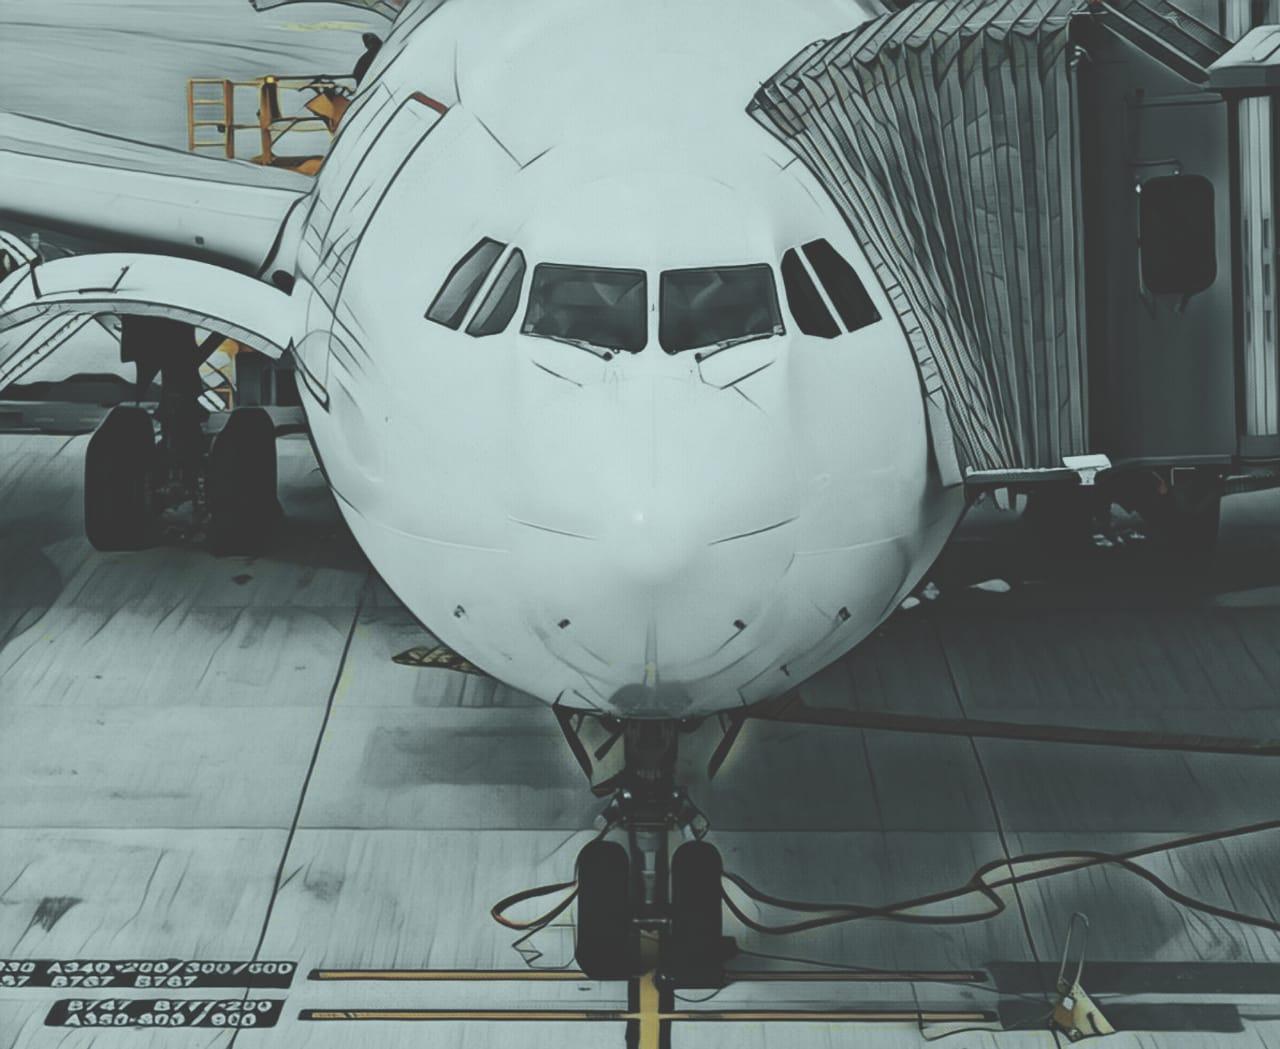 https: img.okezone.com content 2021 01 05 320 2339460 knkt-cek-bangkai-pesawat-diduga-milik-airasia-hasilnya-EczPL14bxU.jpeg